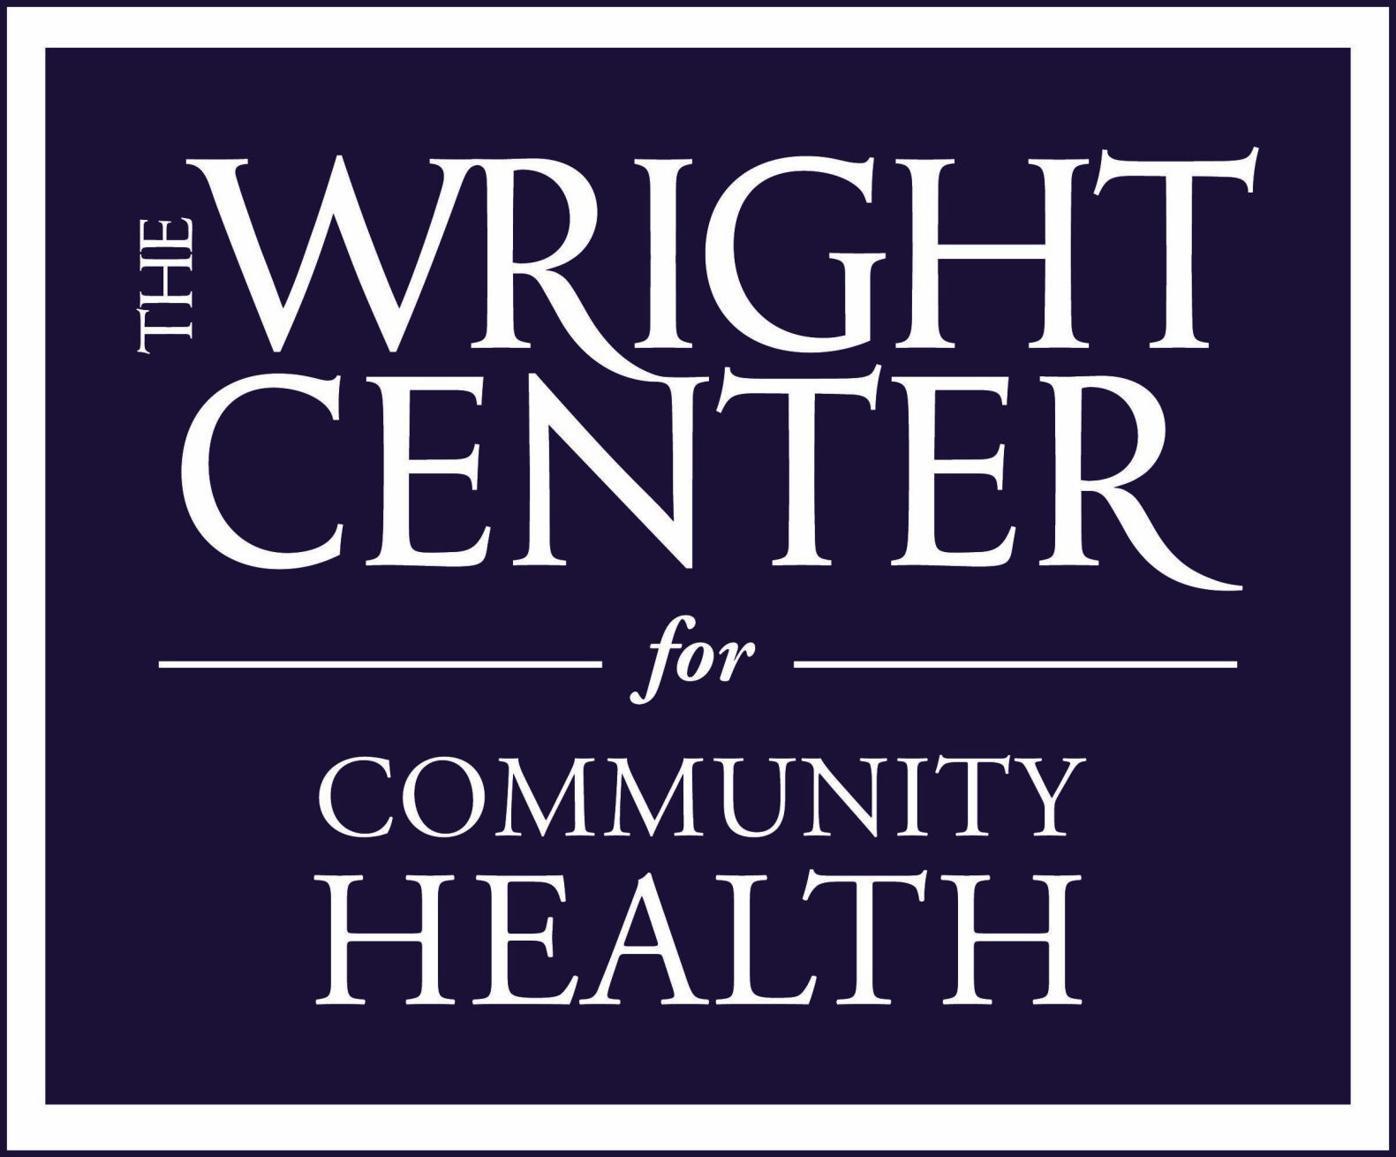 Wrght Center logo